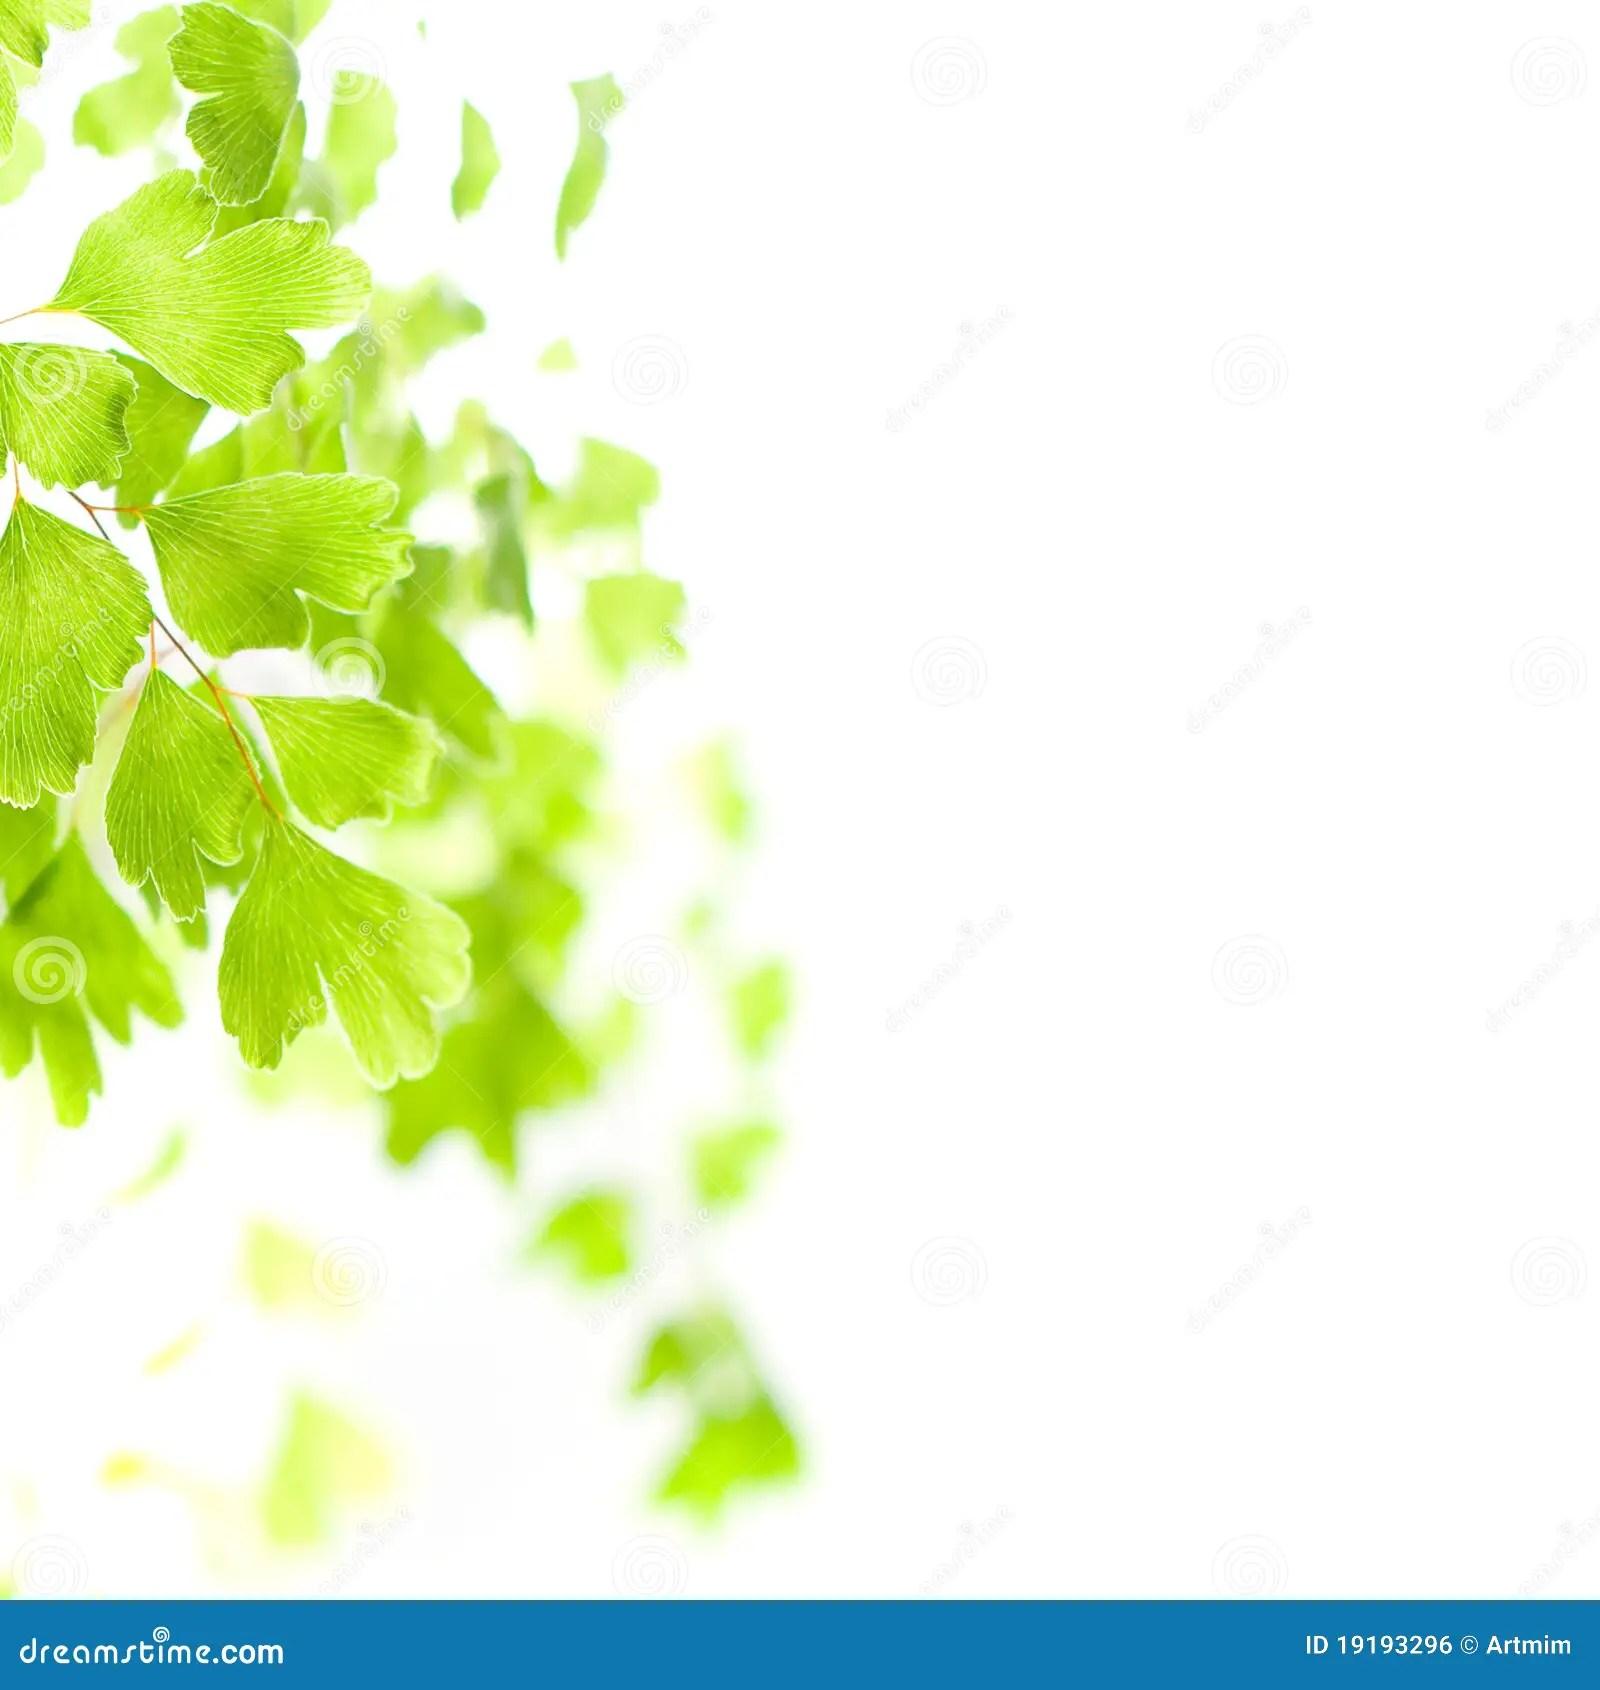 Wallpaper Border Falling Off Green Leaves In Light Stock Photo Image Of Leaf Light